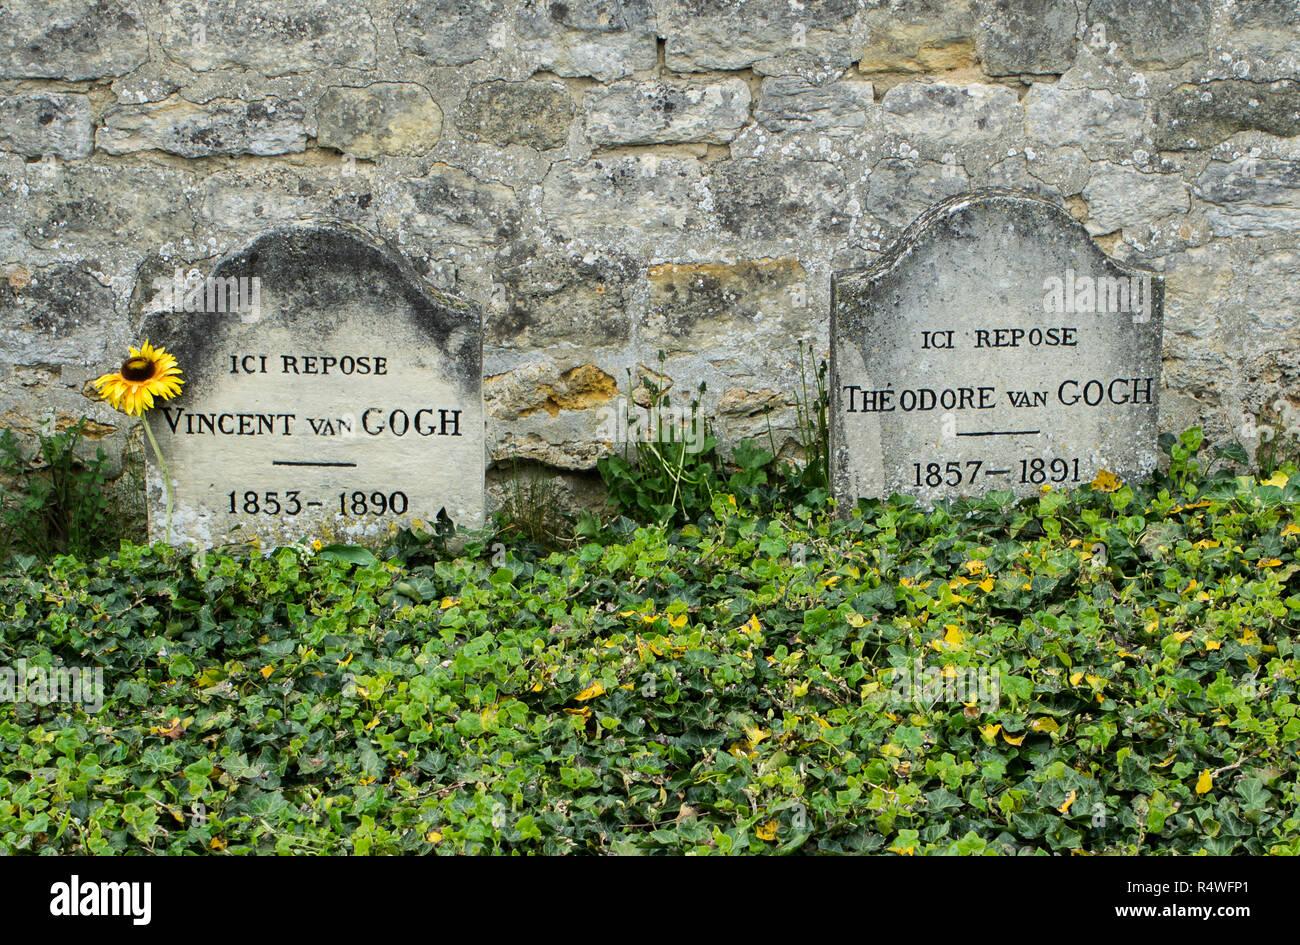 Grave of Vincent van Gogh in Auvers France